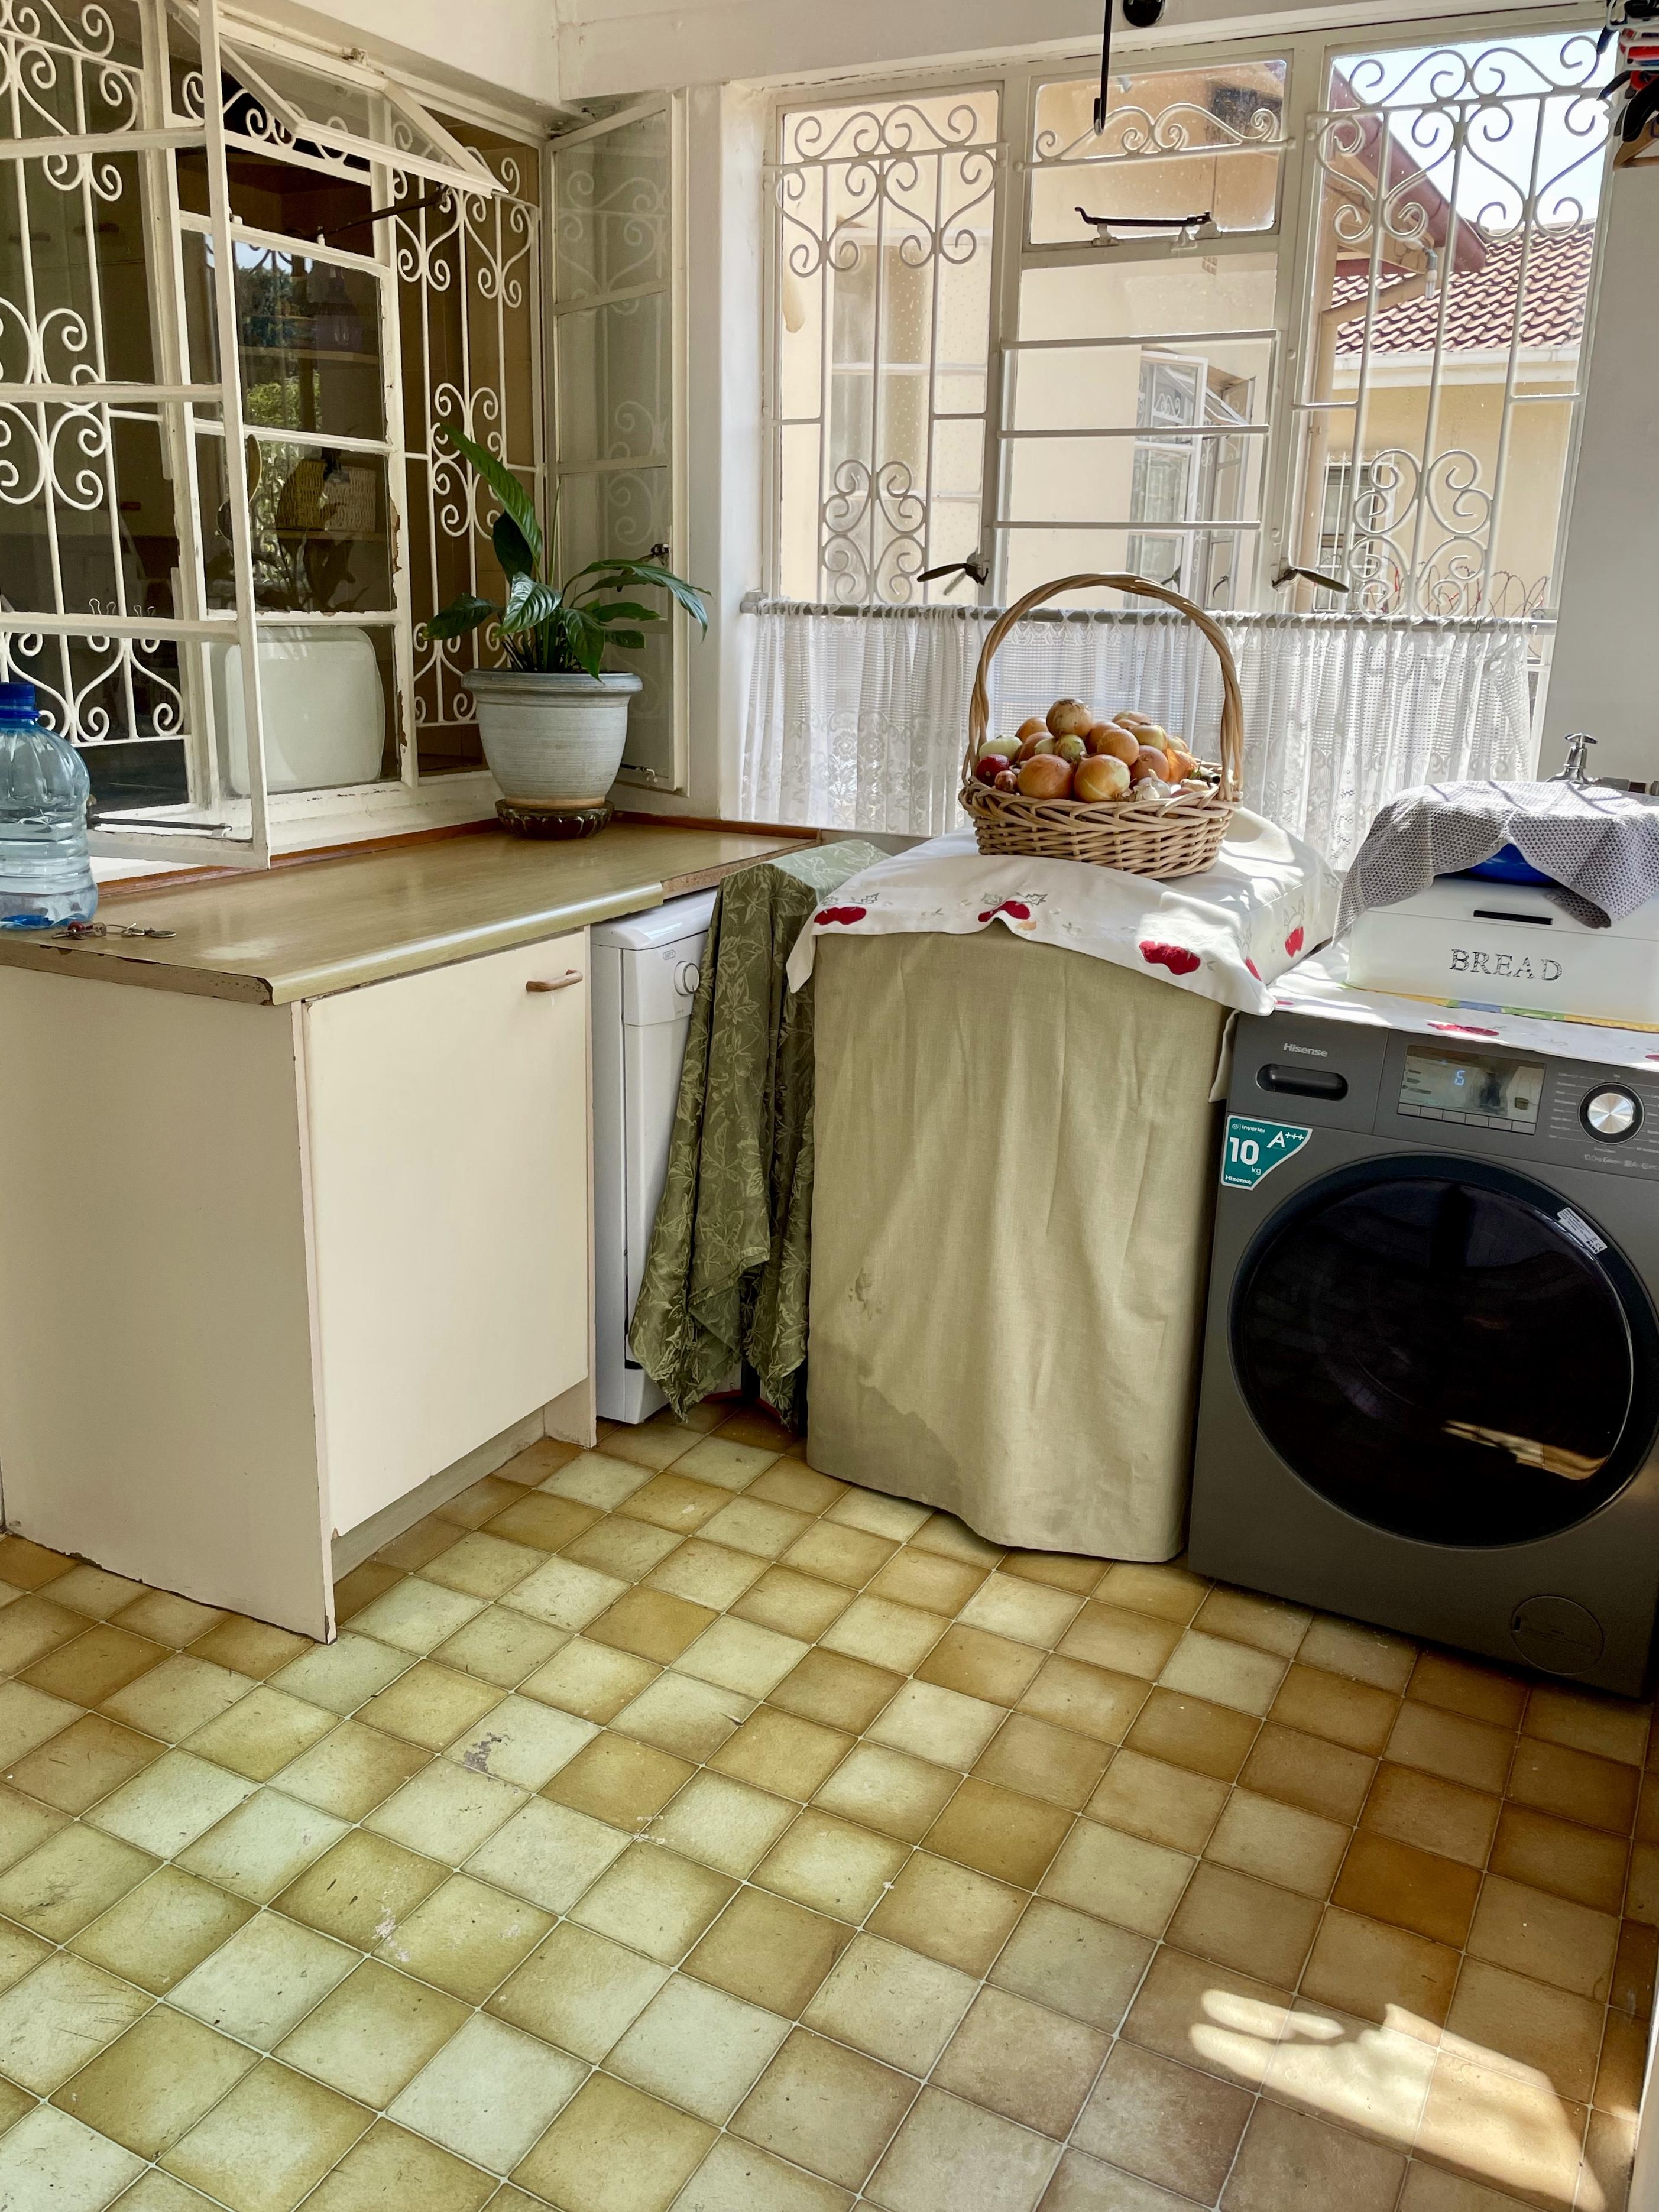 14 Rollo, Cyrildene Johannesburg, Gauteng, 4 Bedrooms Bedrooms, ,2 BathroomsBathrooms,House,Reserved,Rollo,1059